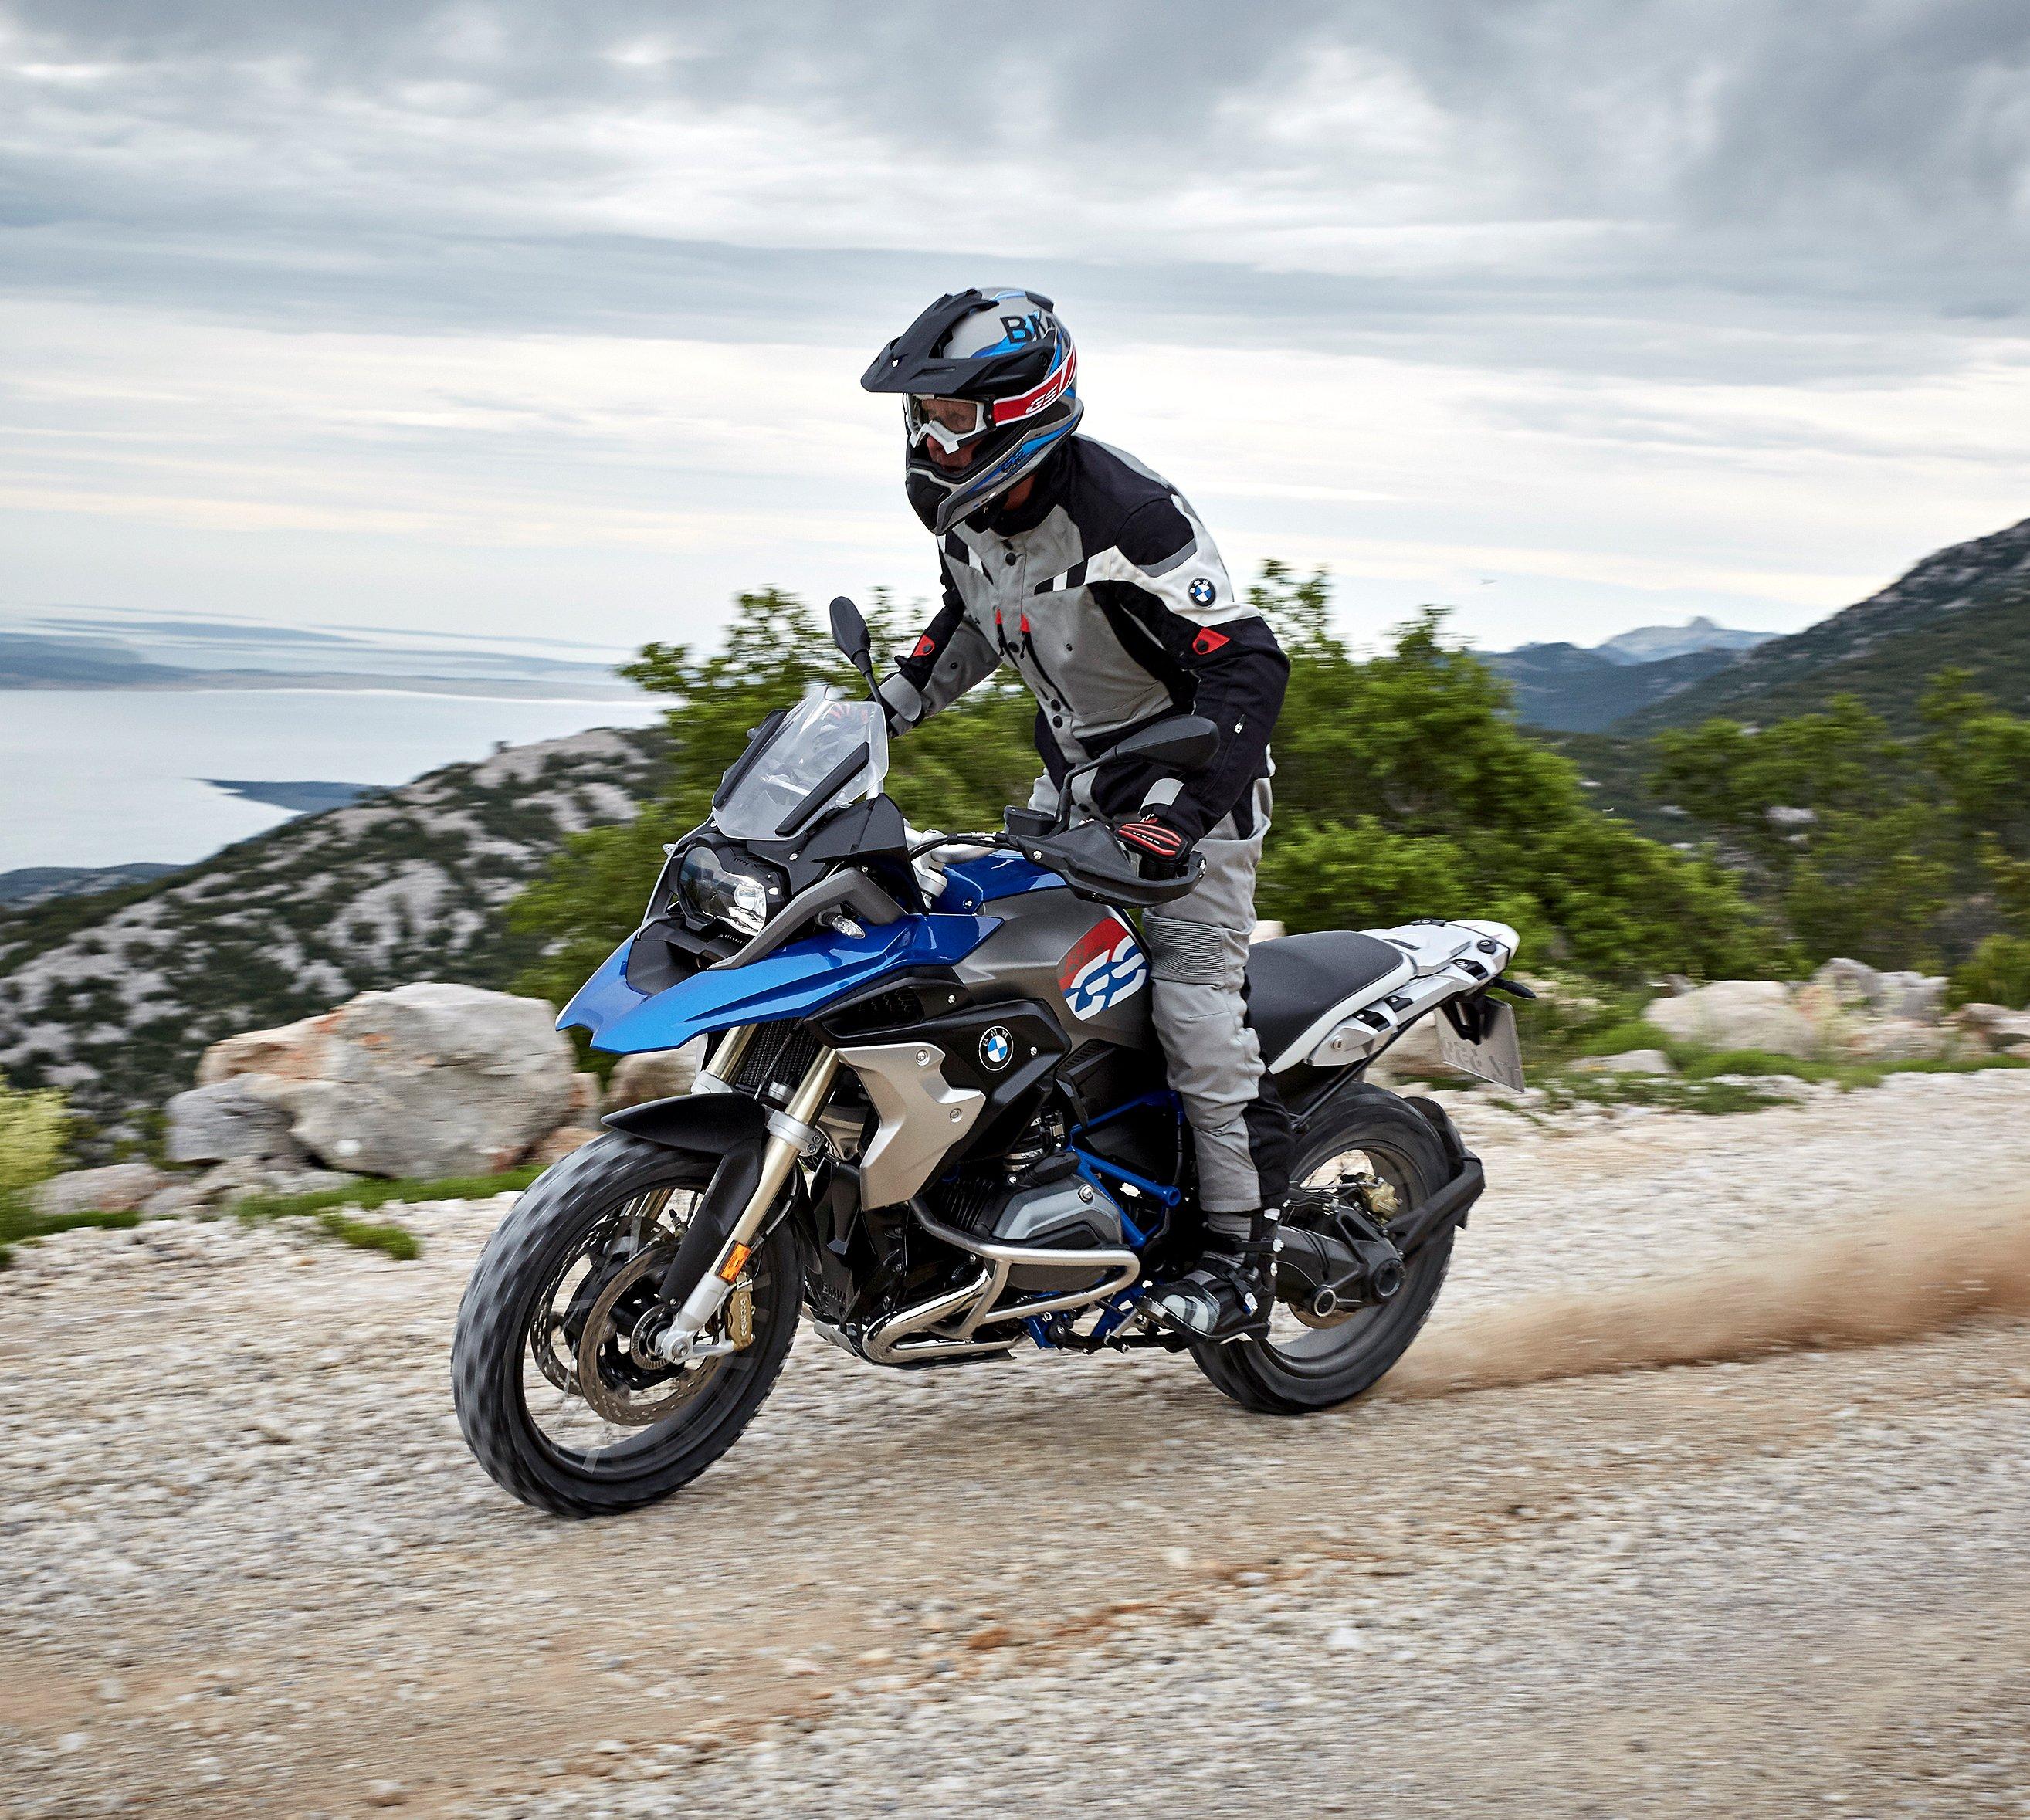 Bmw motos motorrad